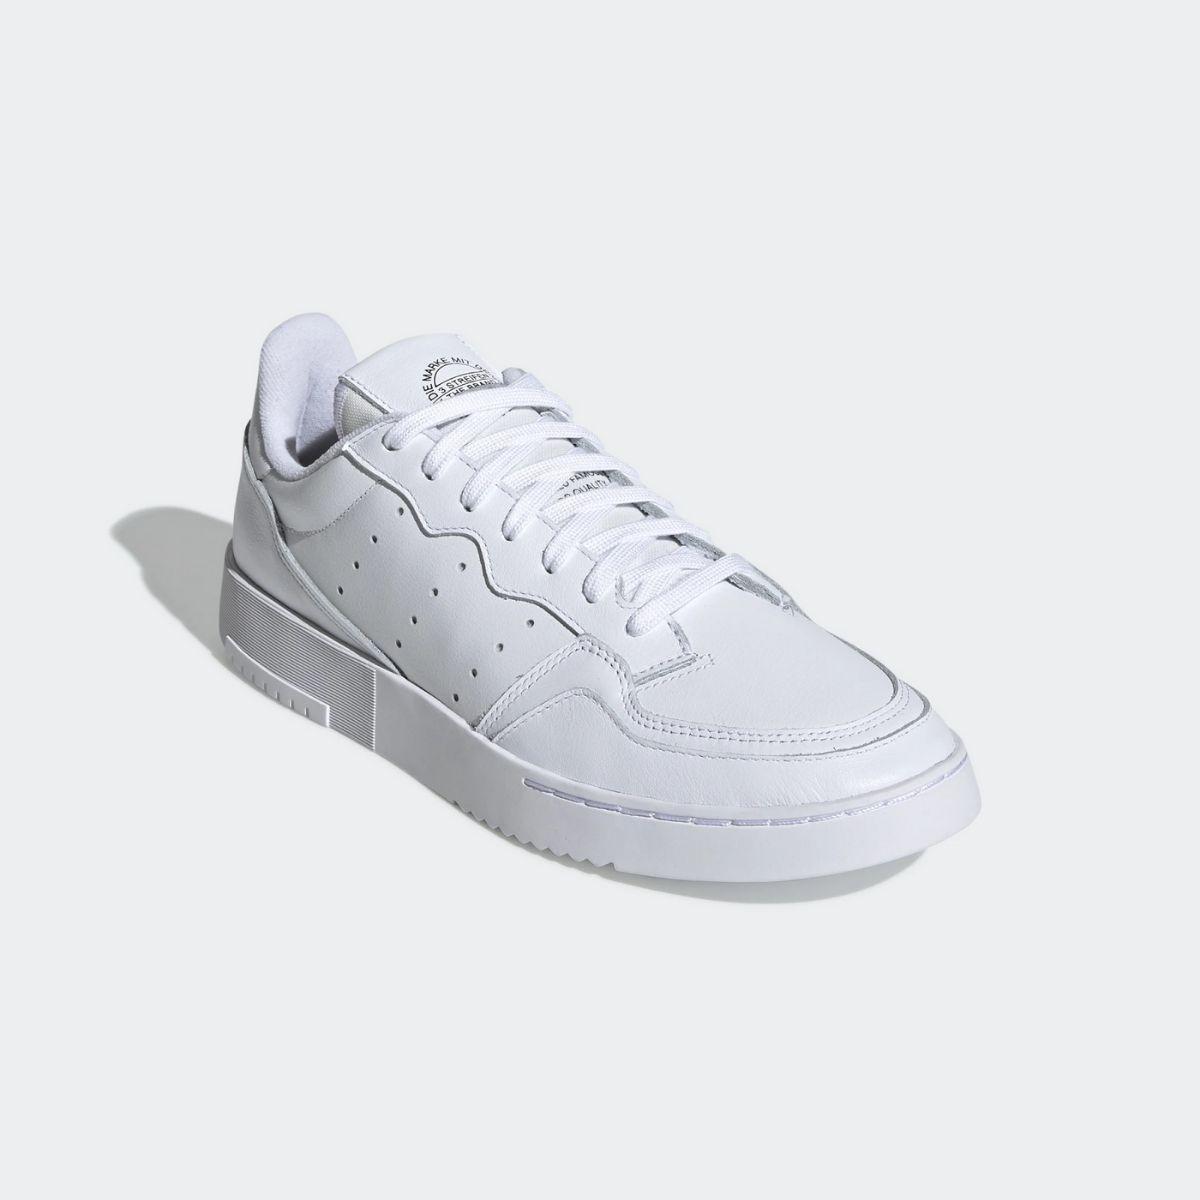 Scarpa Adidas Supercourt In...